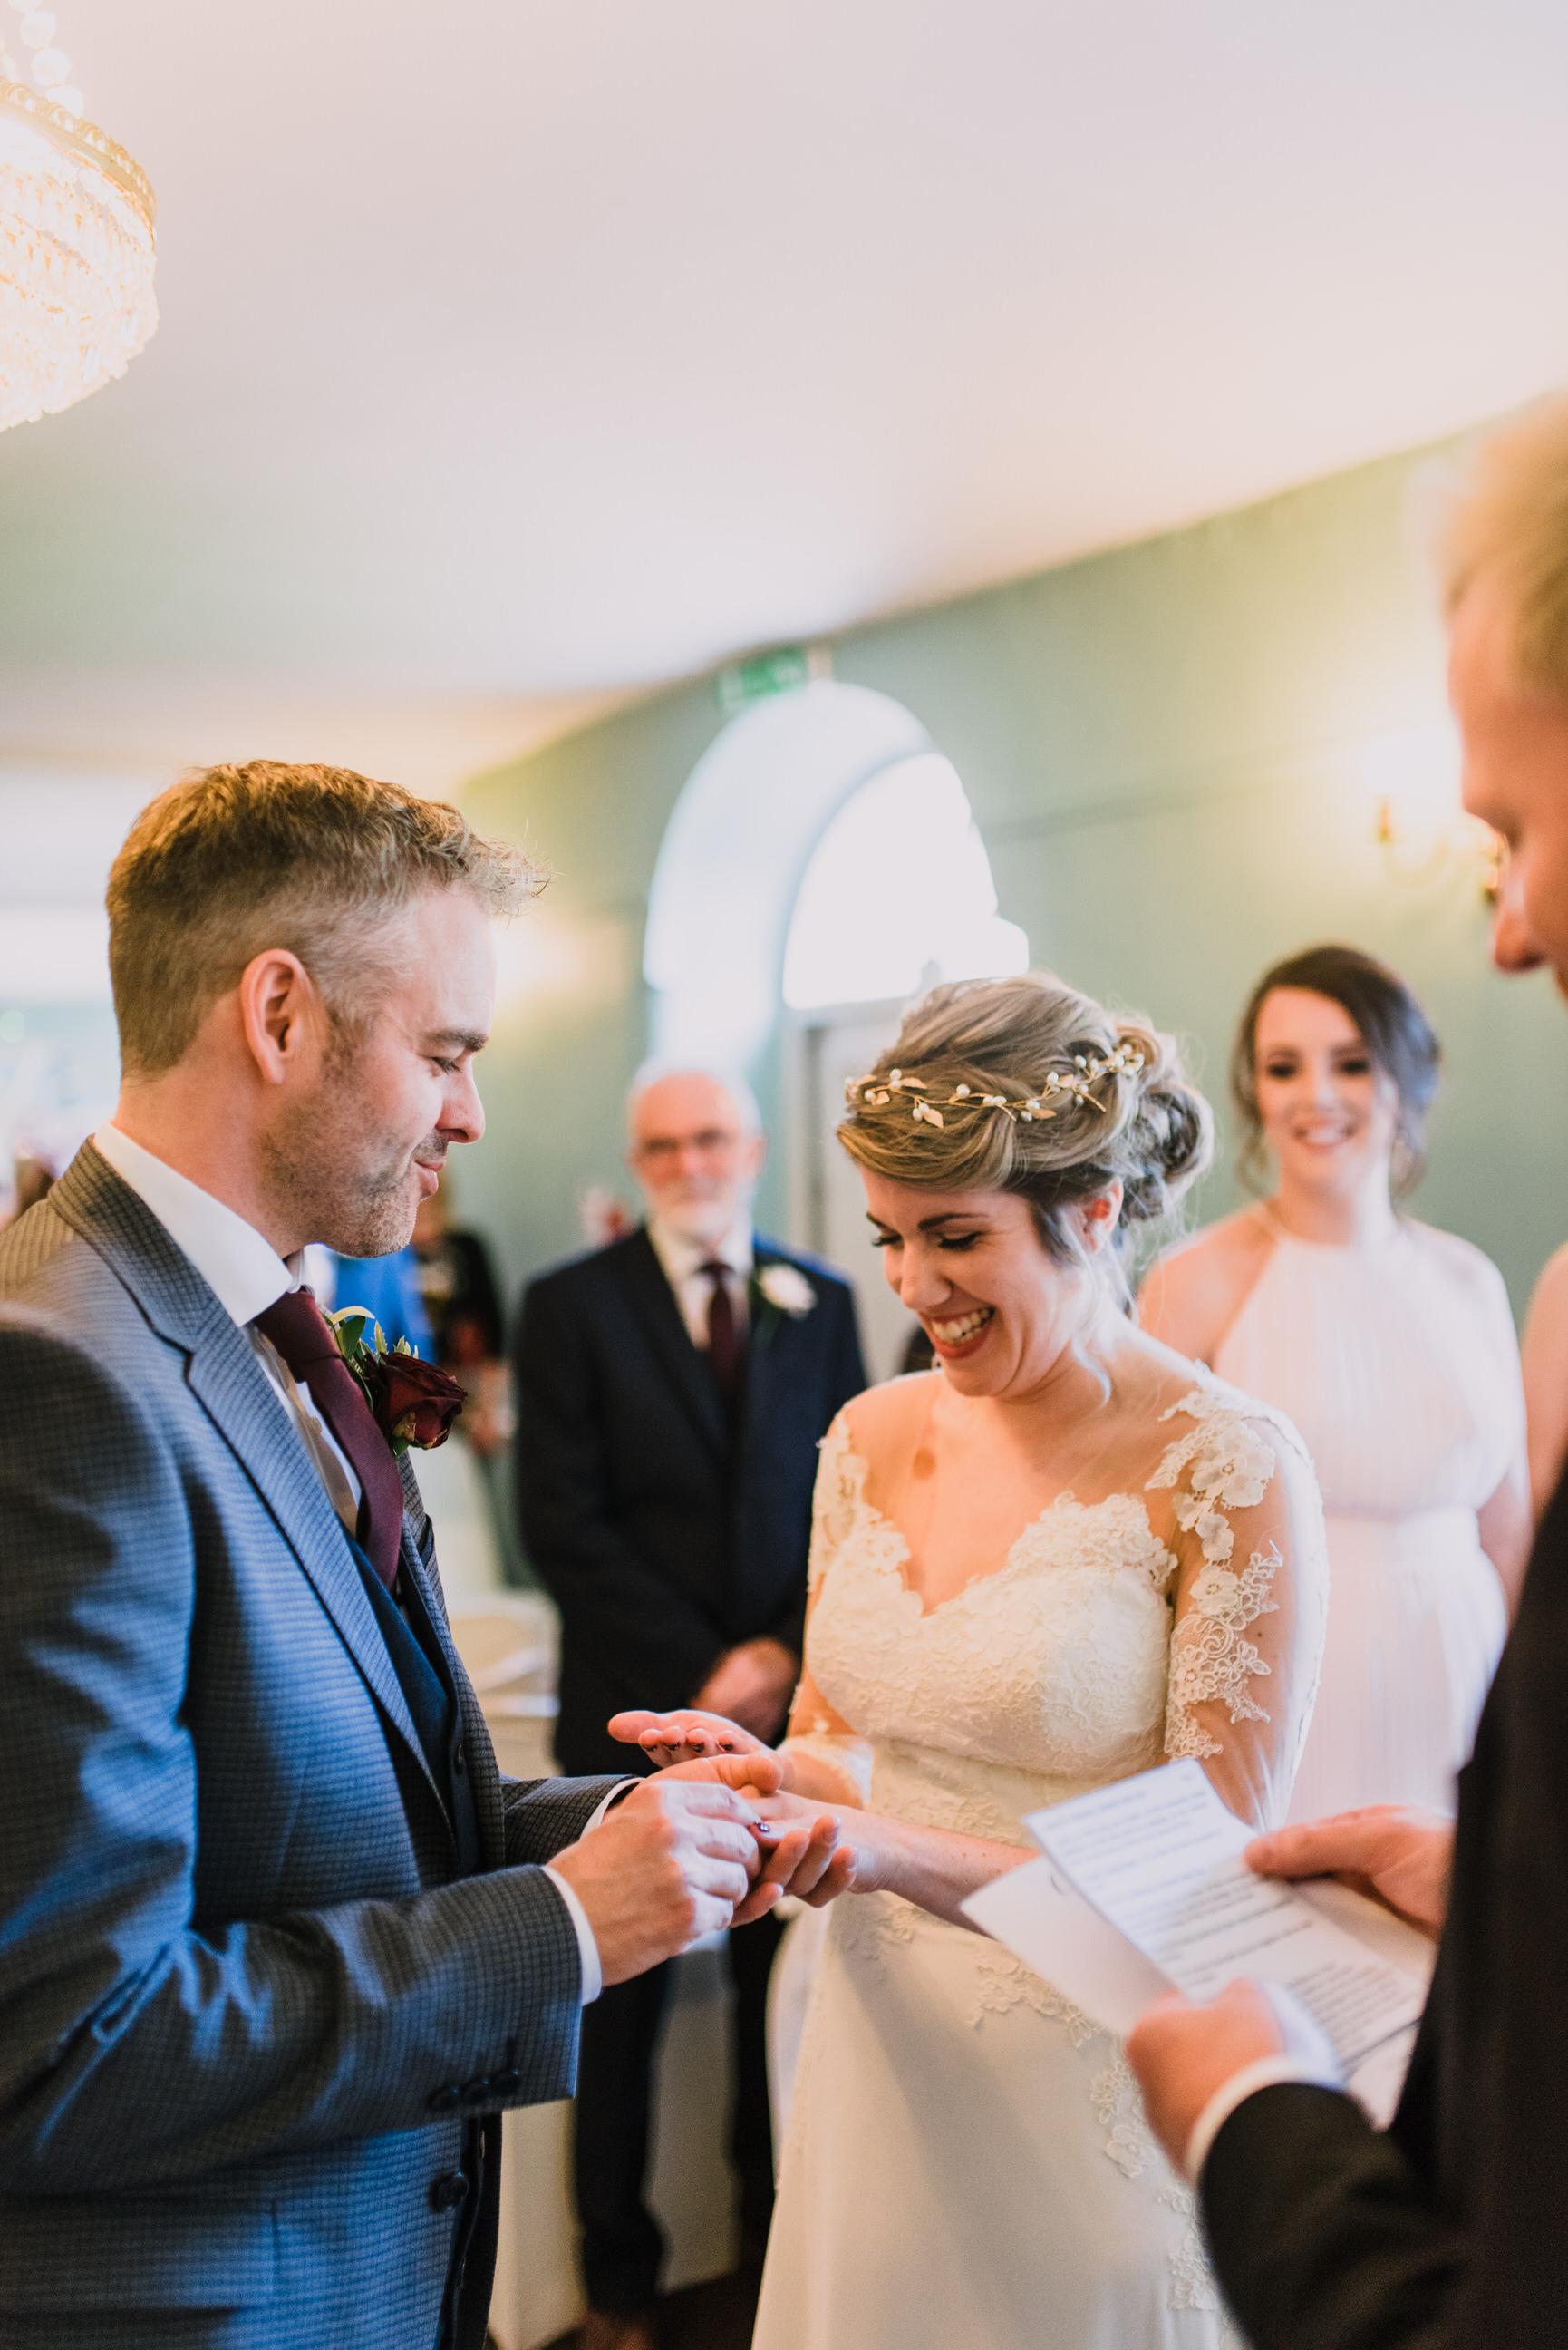 lissanoure castle wedding, northern ireland wedding photographer, romantic northern irish wedding venue, castle wedding ireland, natural wedding photography ni (55).jpg